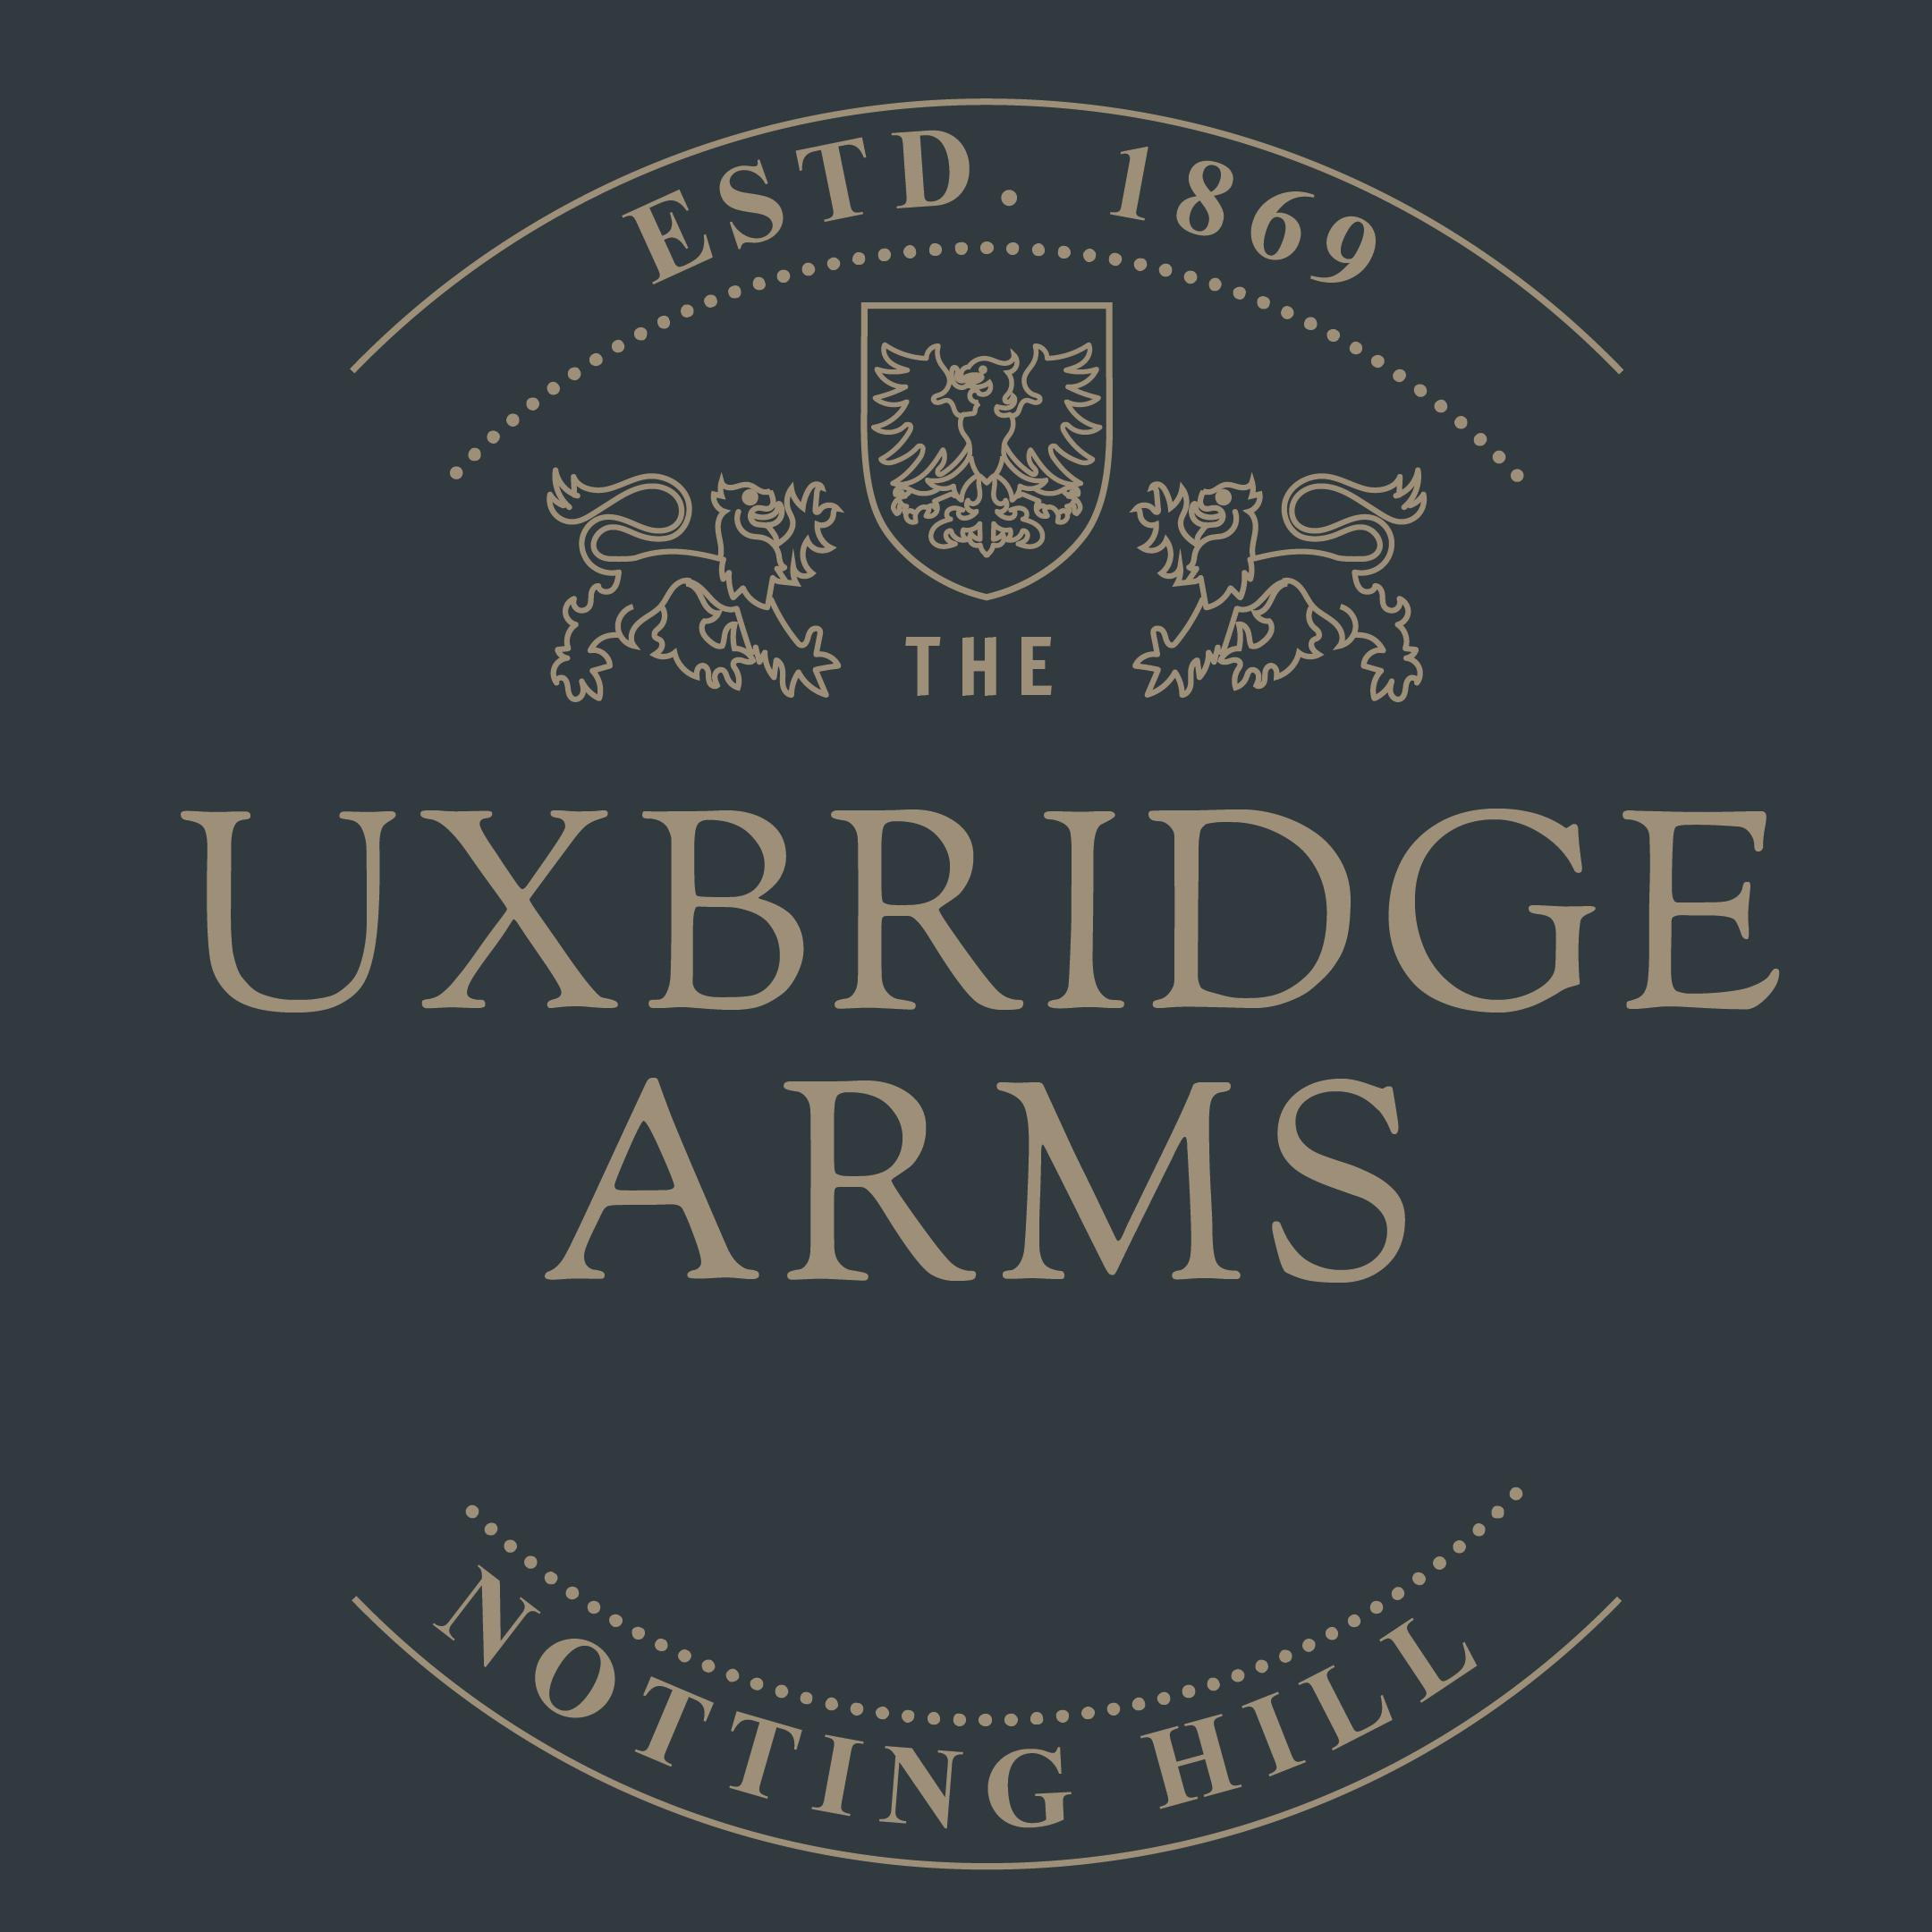 The Uxbridge Arms